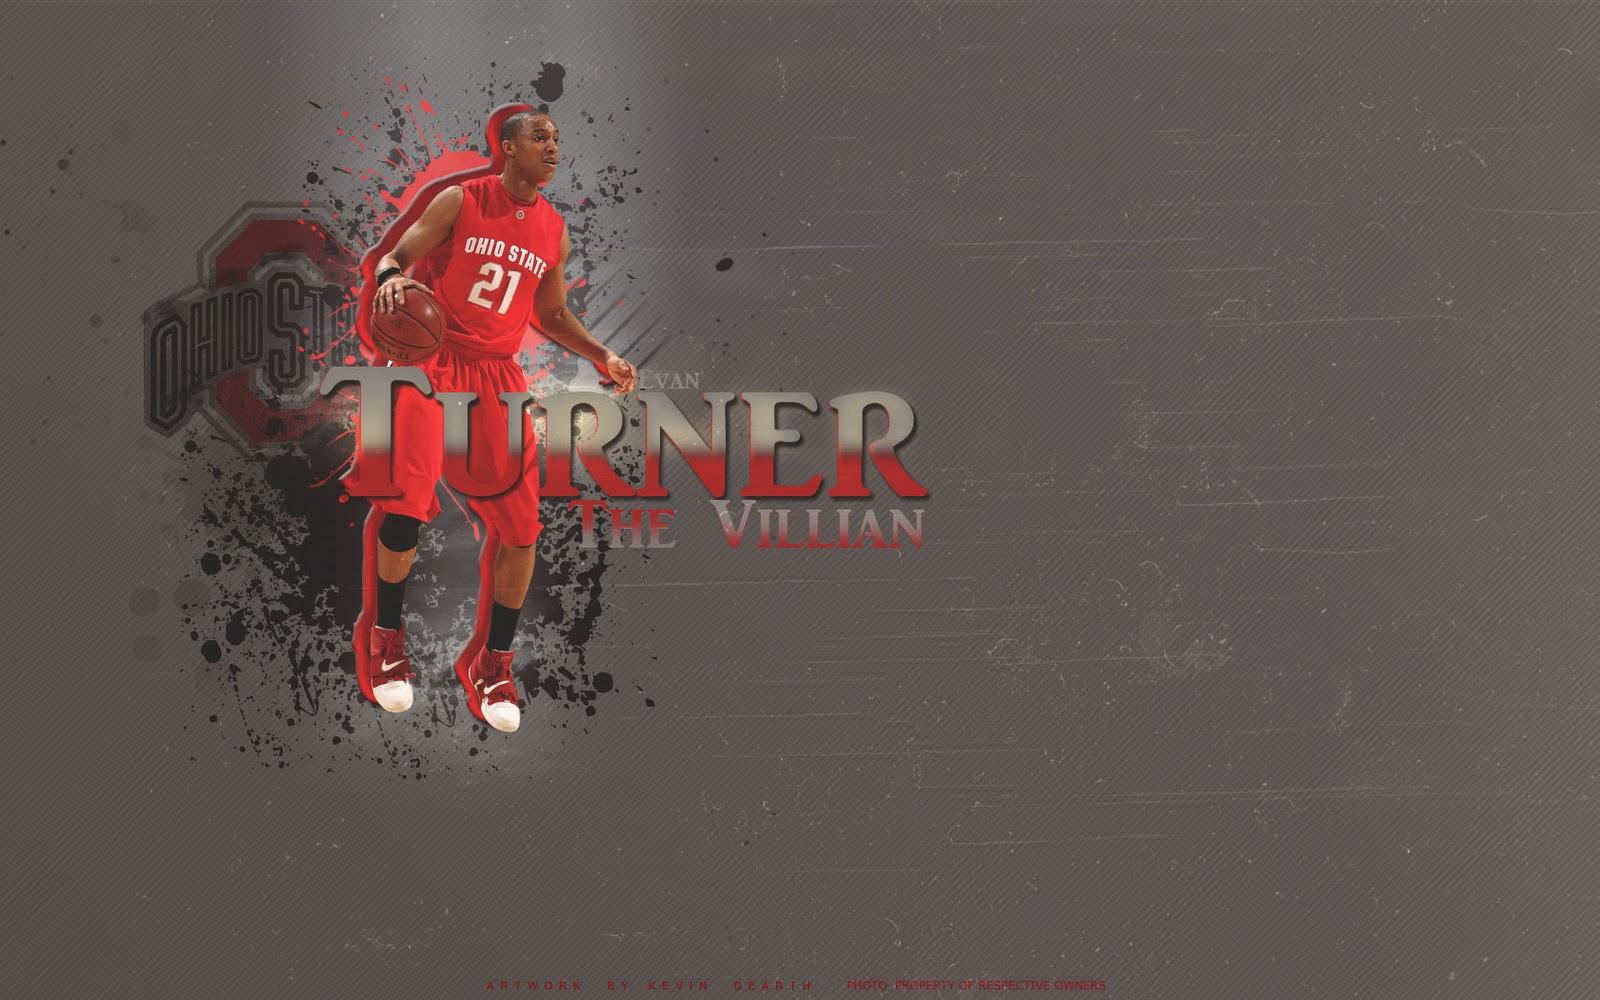 http://1.bp.blogspot.com/_0_IbsH3Iw48/TKF43vSTNVI/AAAAAAAACdQ/9fJRFTyFlok/s1600/Evan-Turner-Wallpaper.jpg